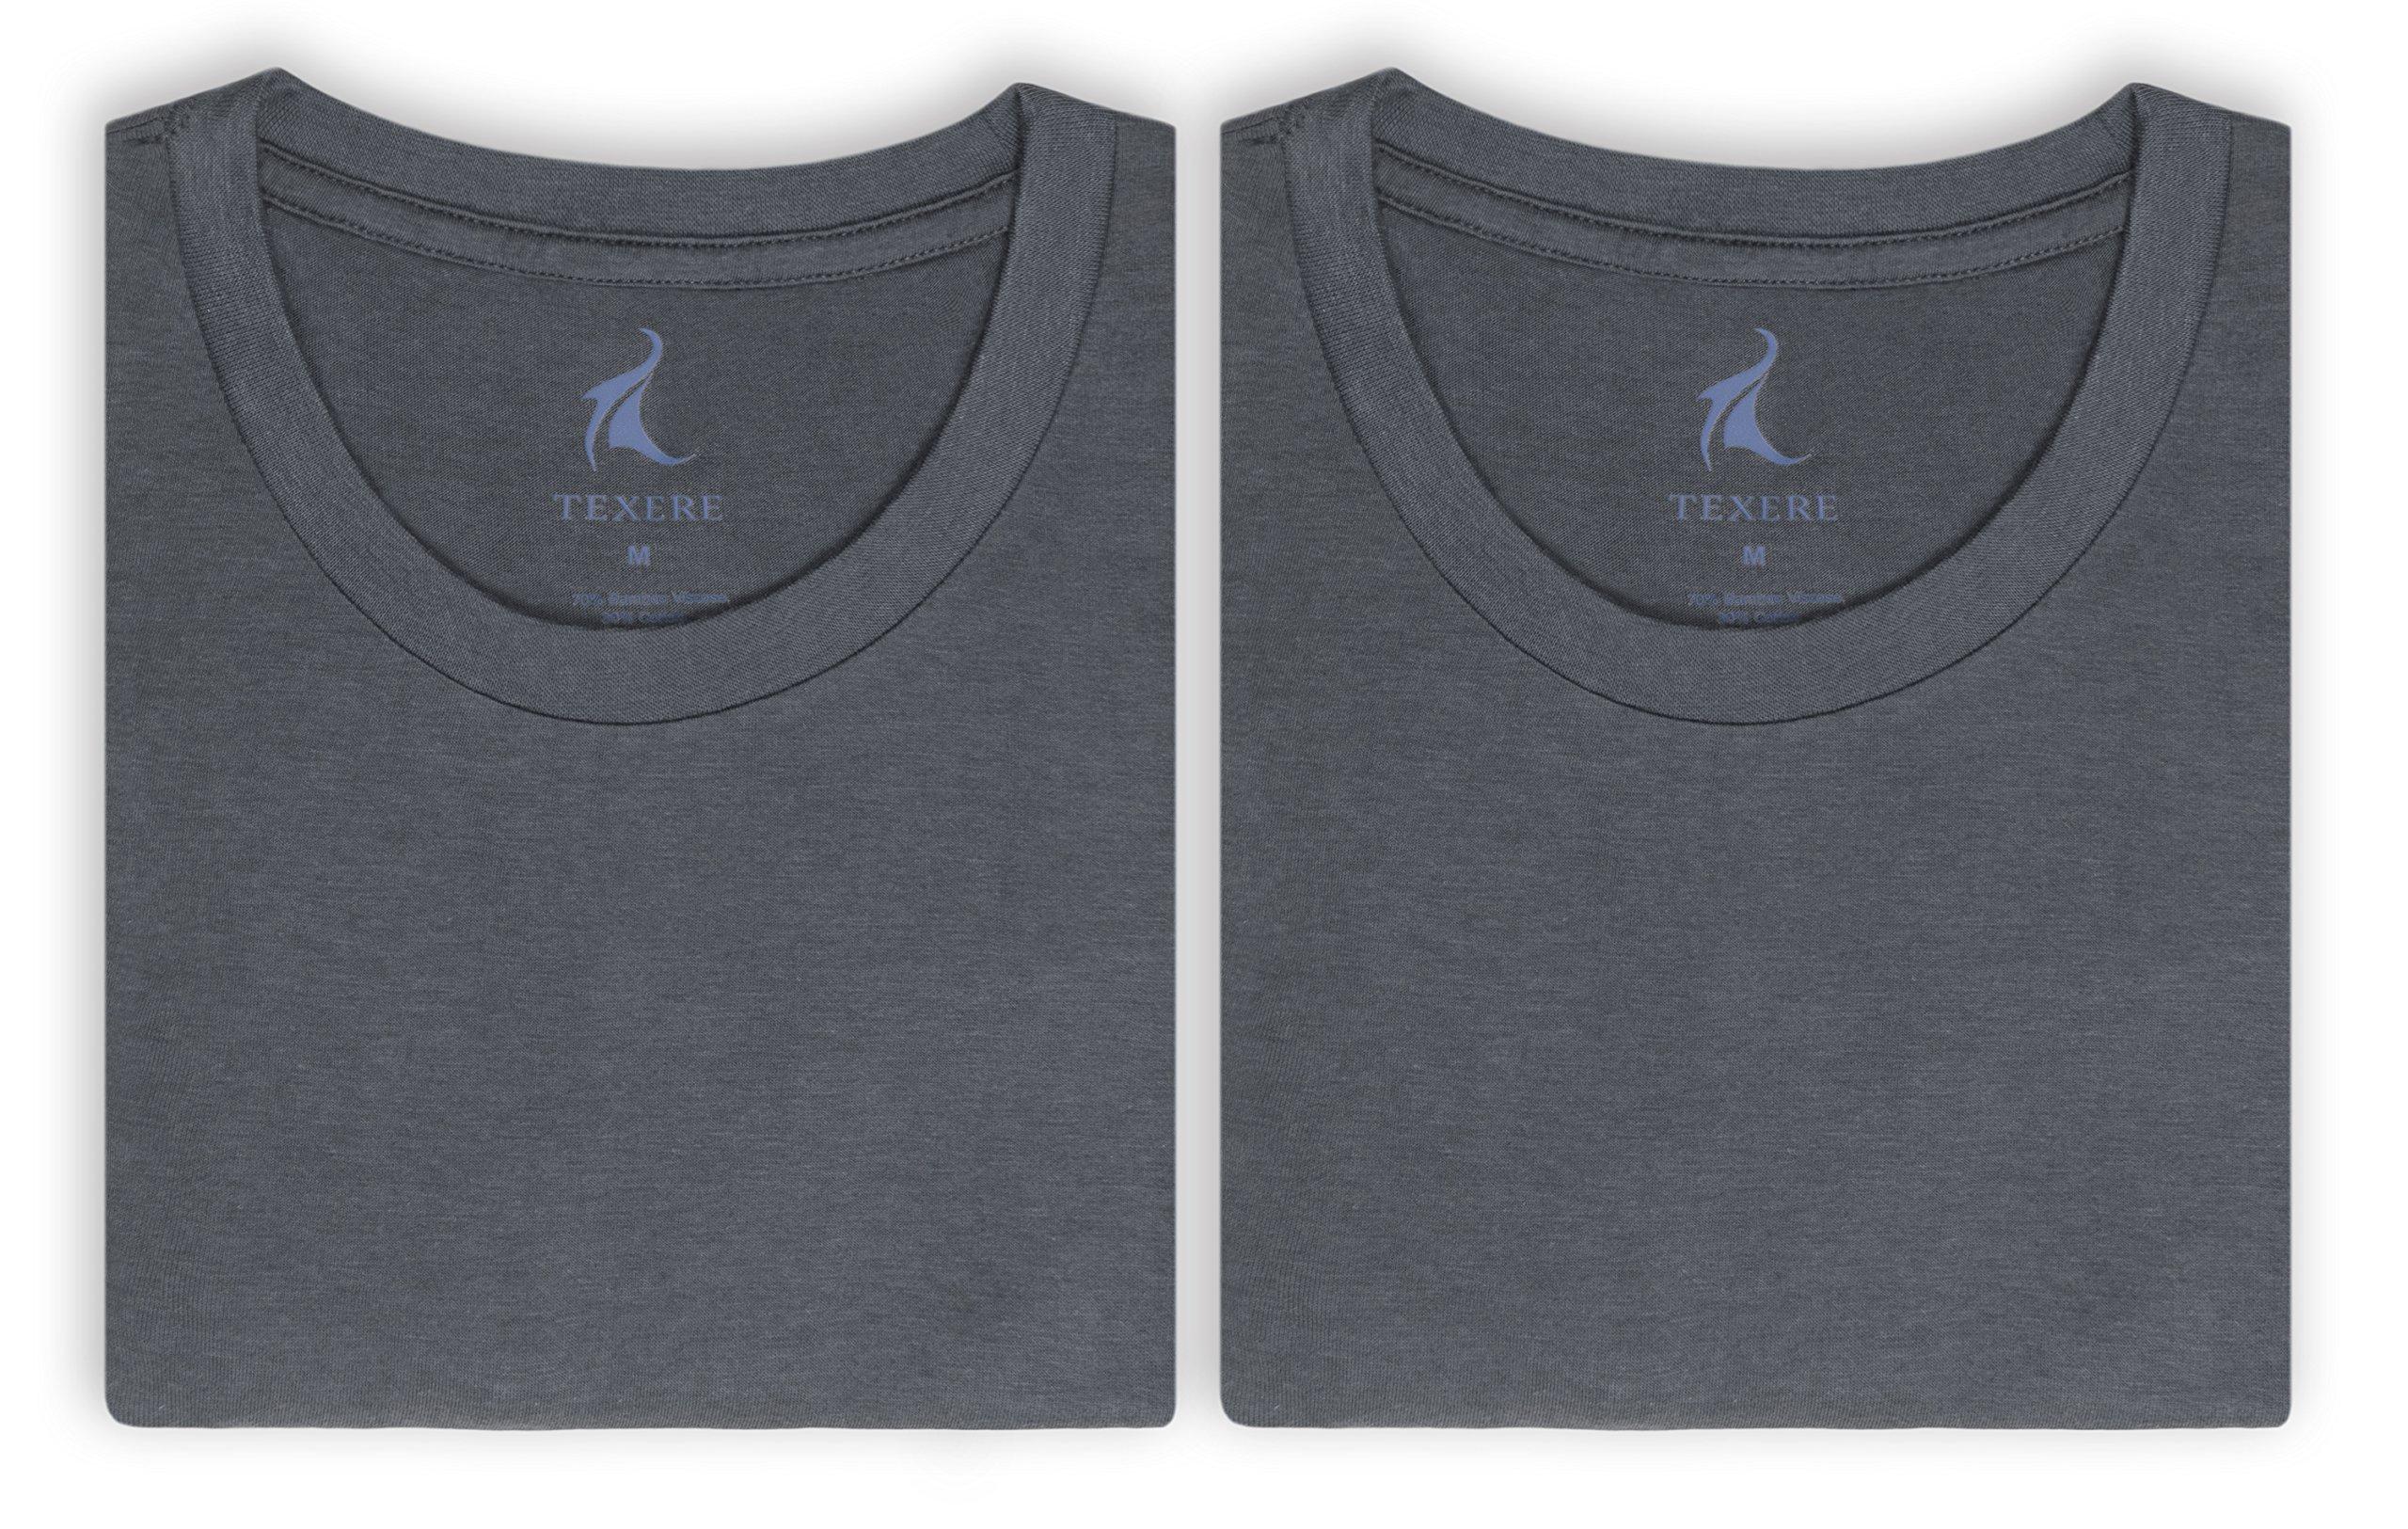 Texere Crew Neck Undershirt for Men (Dexx, Charcoal, XXL) Super Soft Loungewear